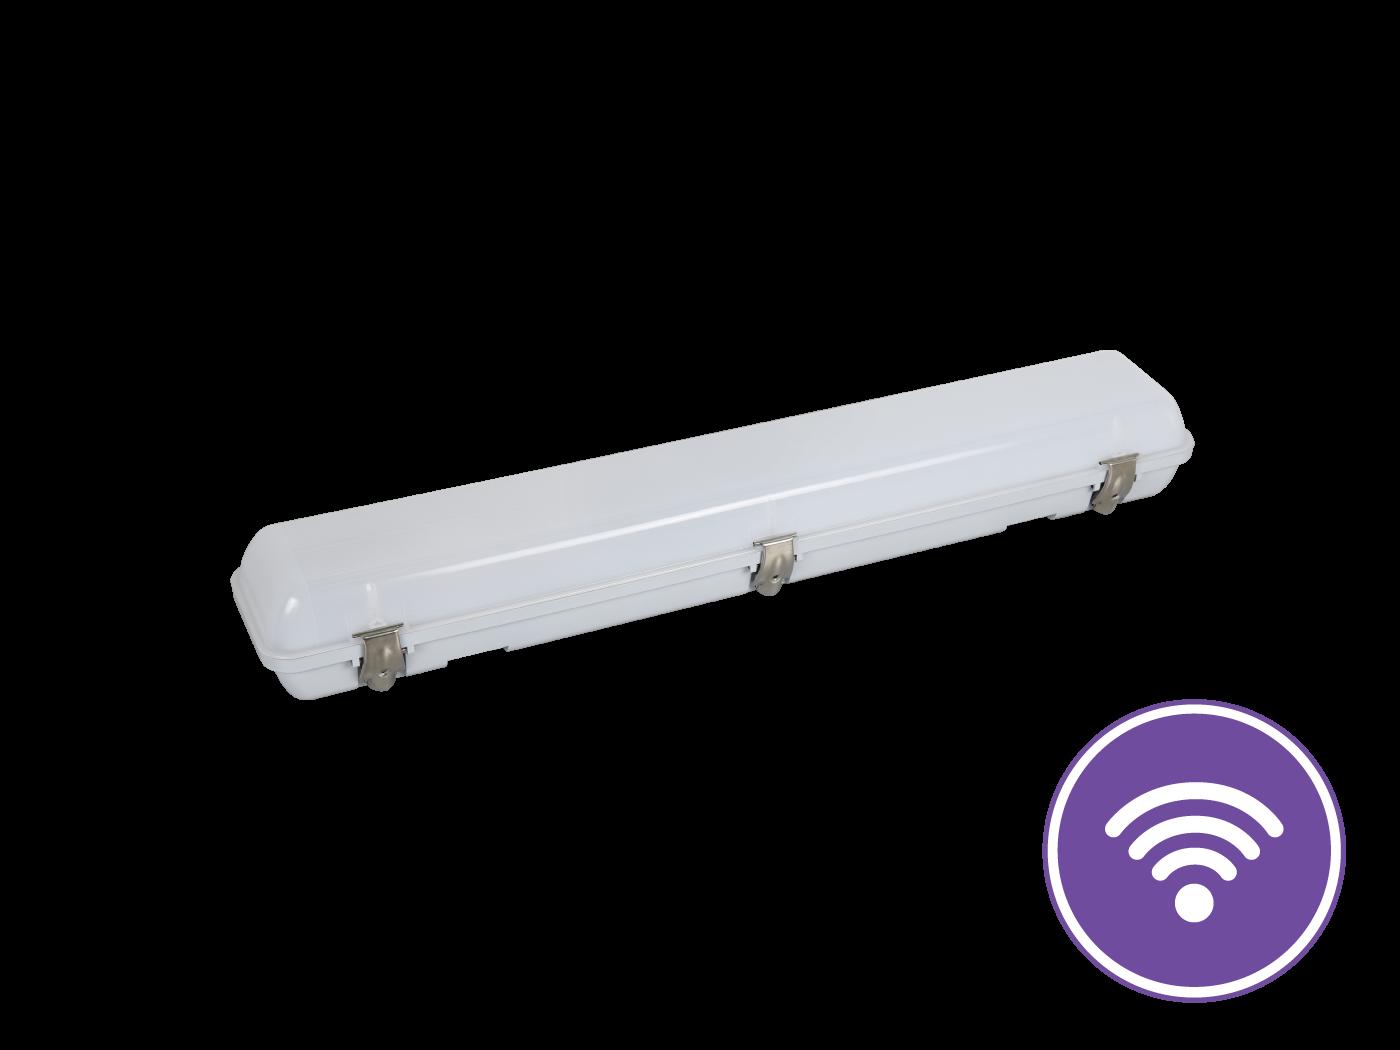 Tempest V IP65 Sensor Batten 2FT